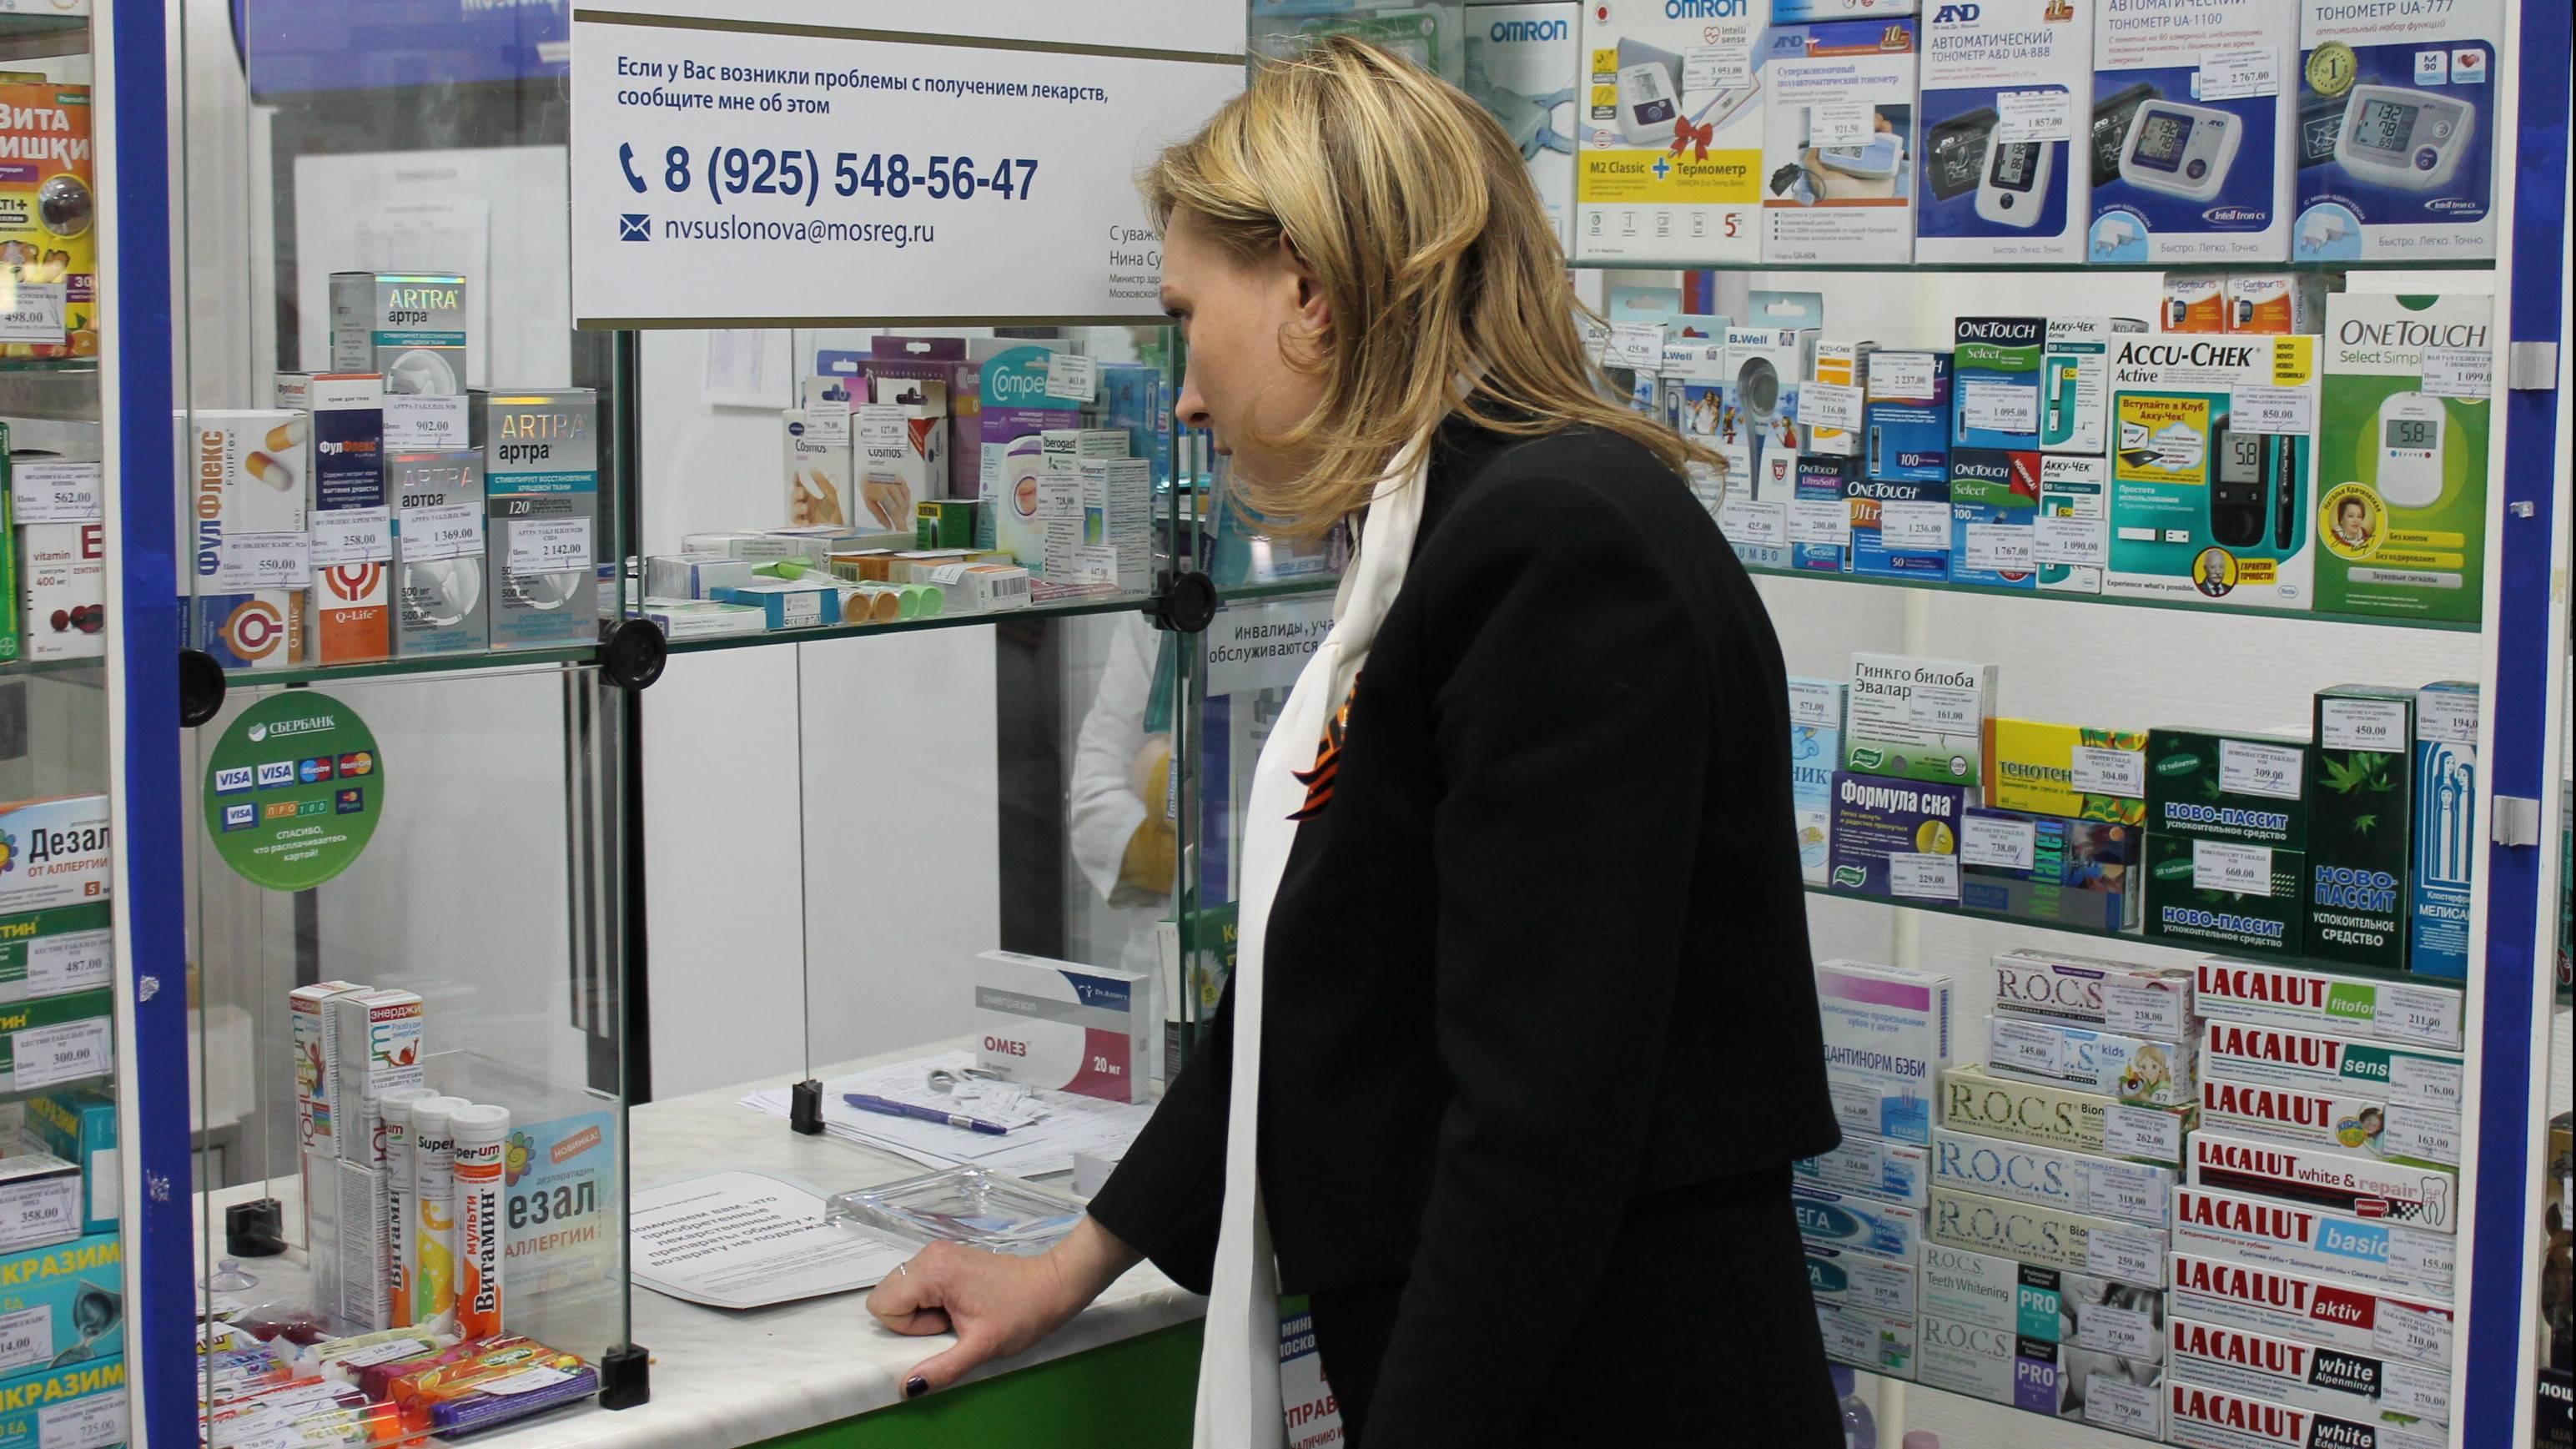 Аптеки белостока: поиск лекарств онлайн, сайты и адреса аптек в белостоке, цены на лекарства